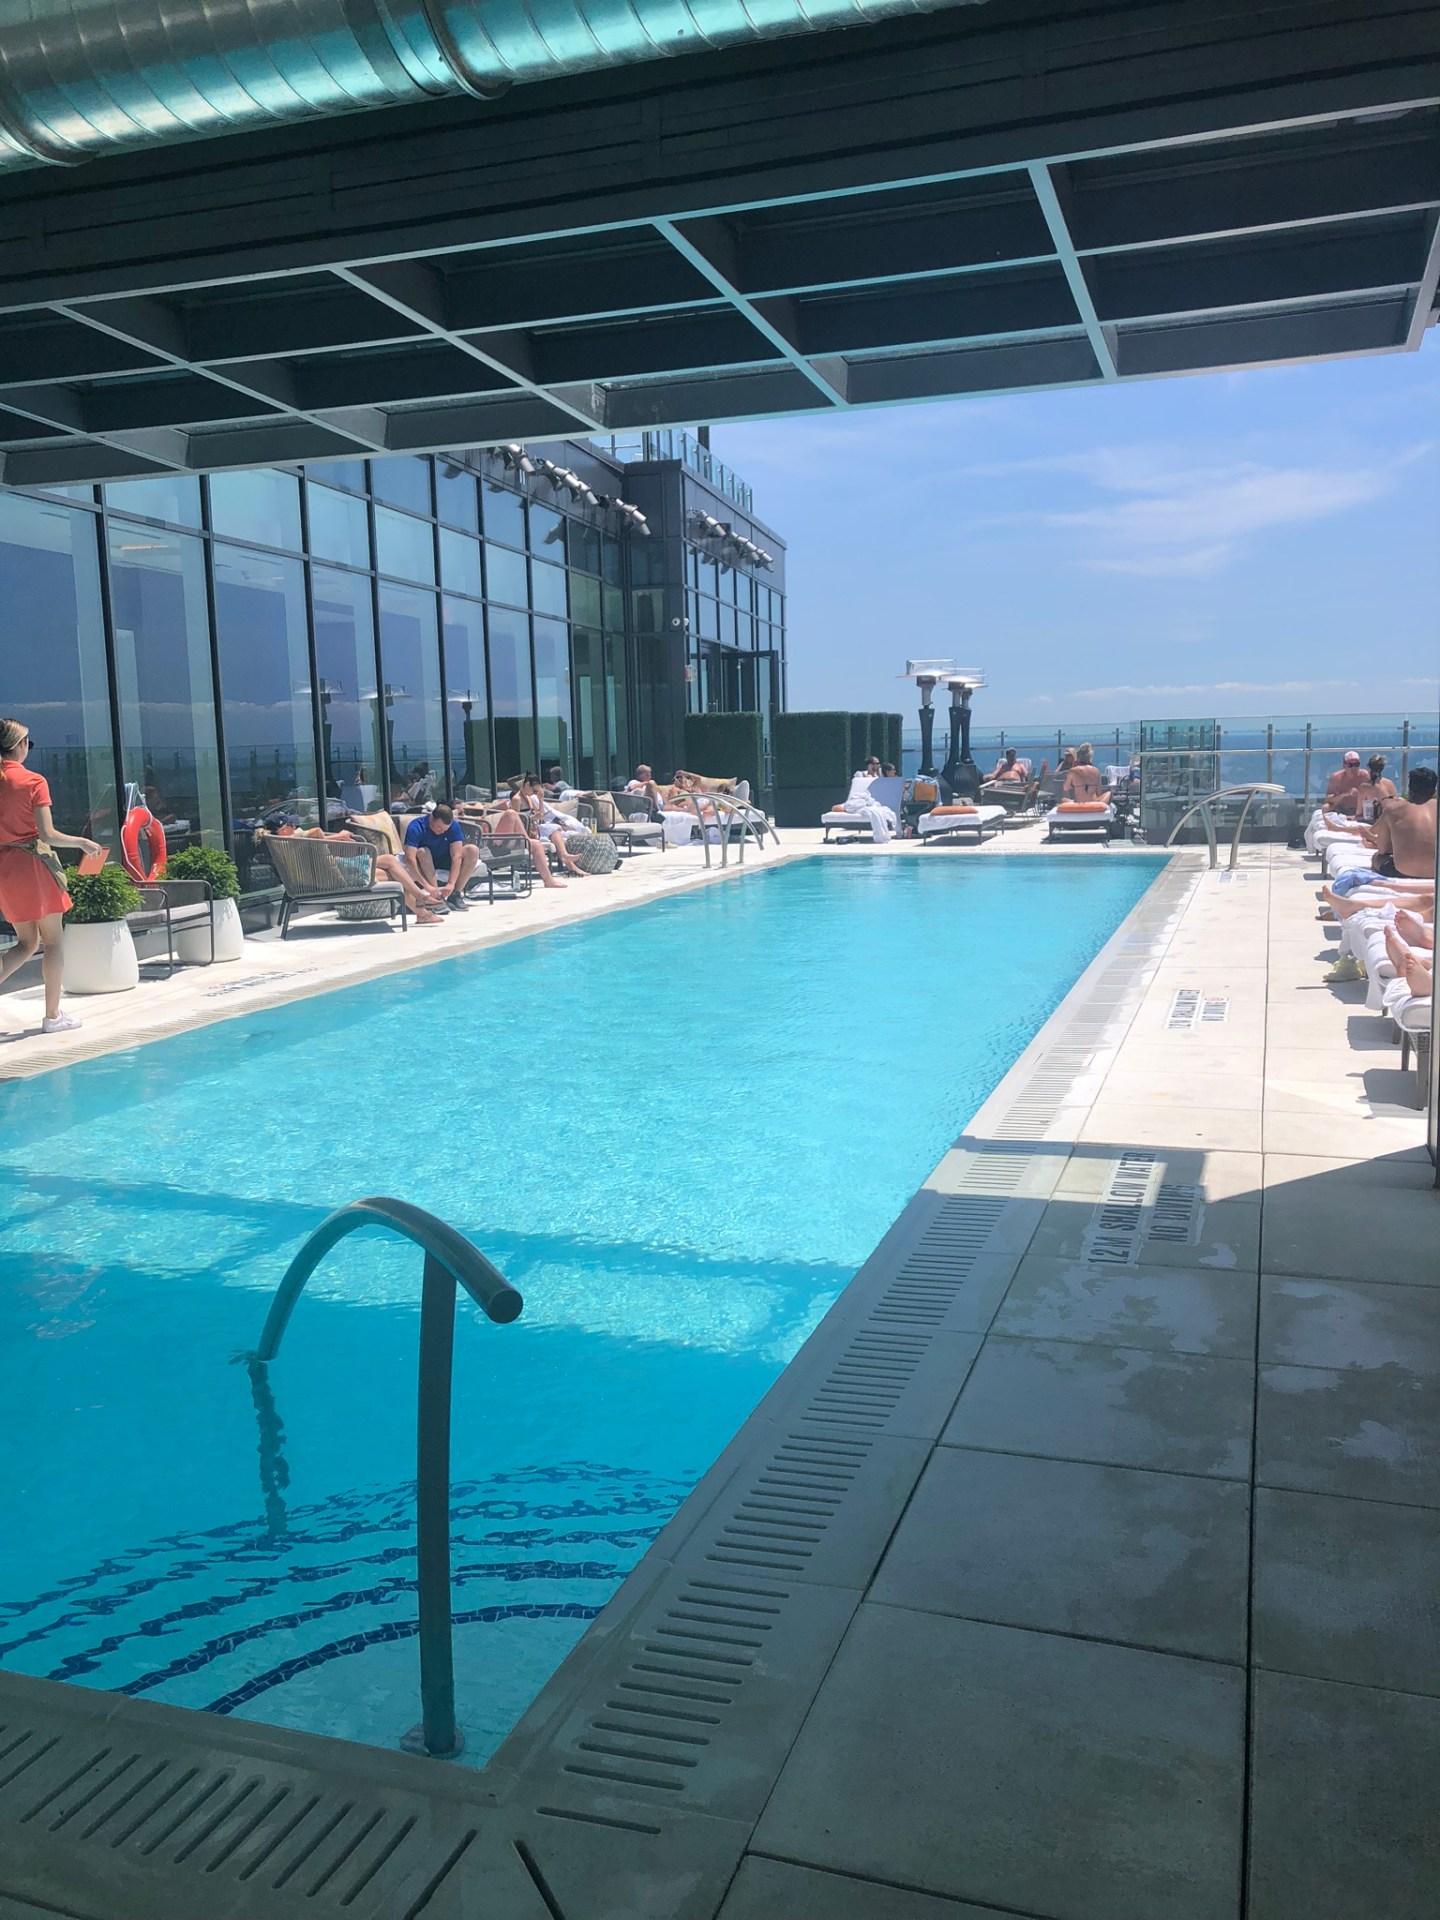 Summer in Toronto: Hotel X rooftop pool